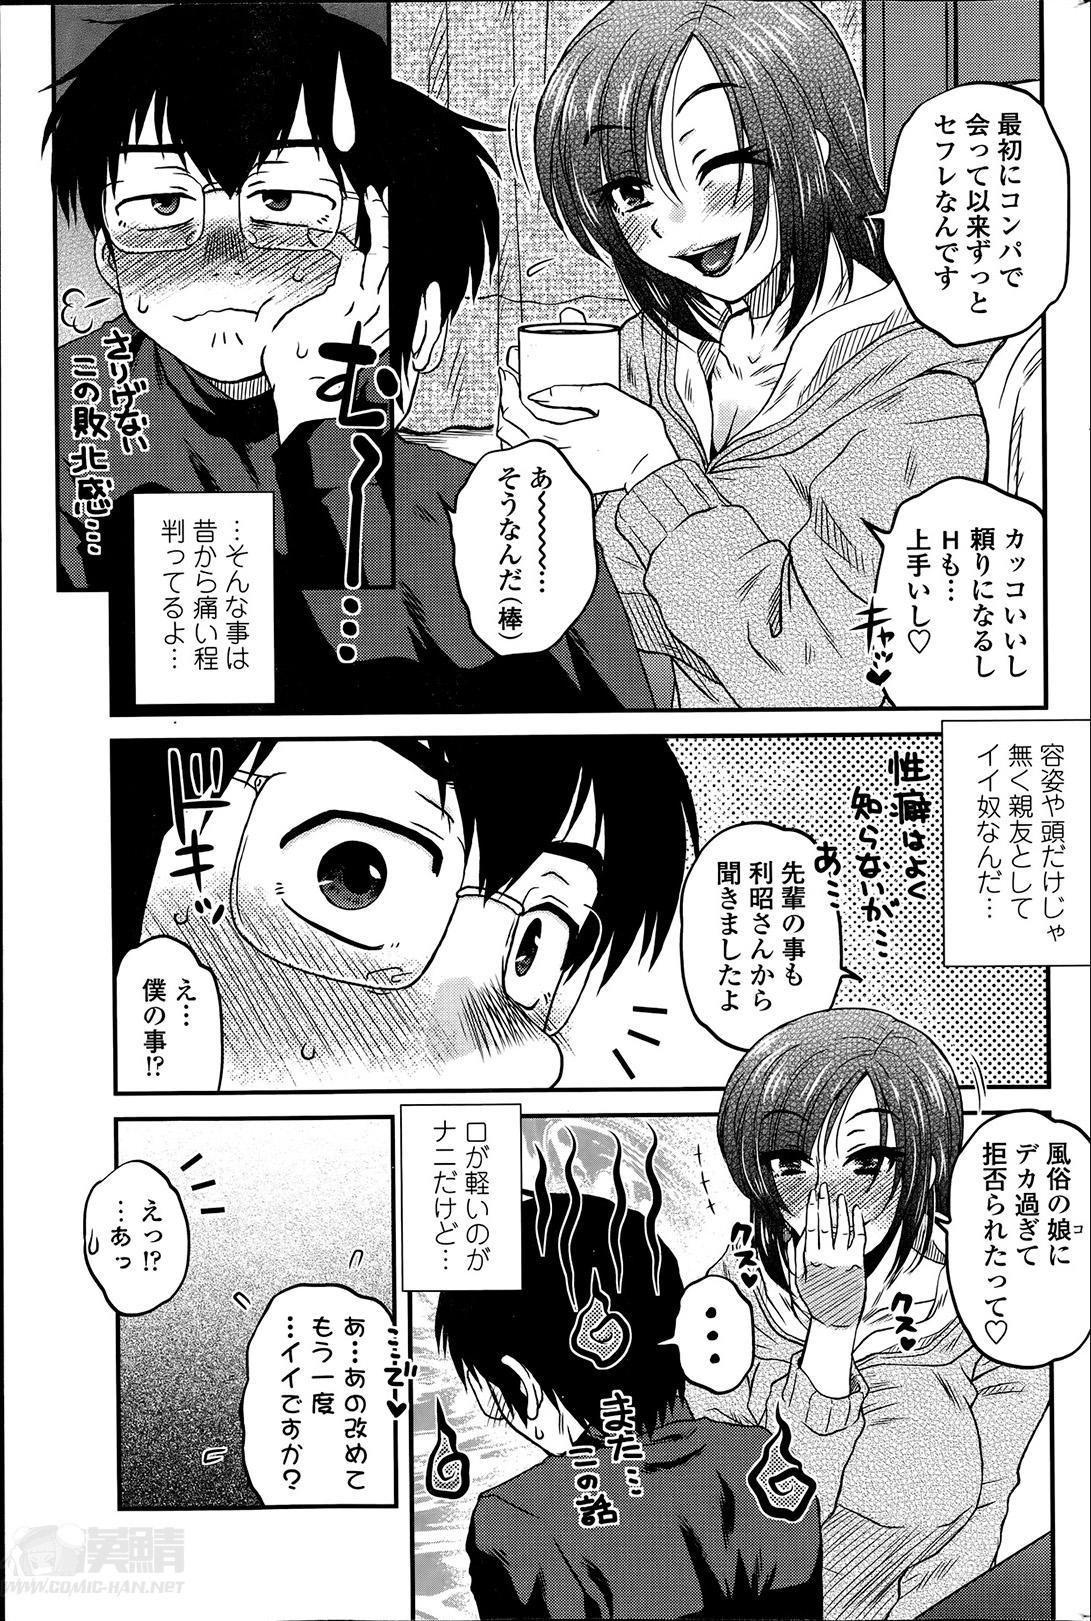 [Kurumiya Mashimin] Mikkai-chuu ni Tsuki Ch.1-6 4